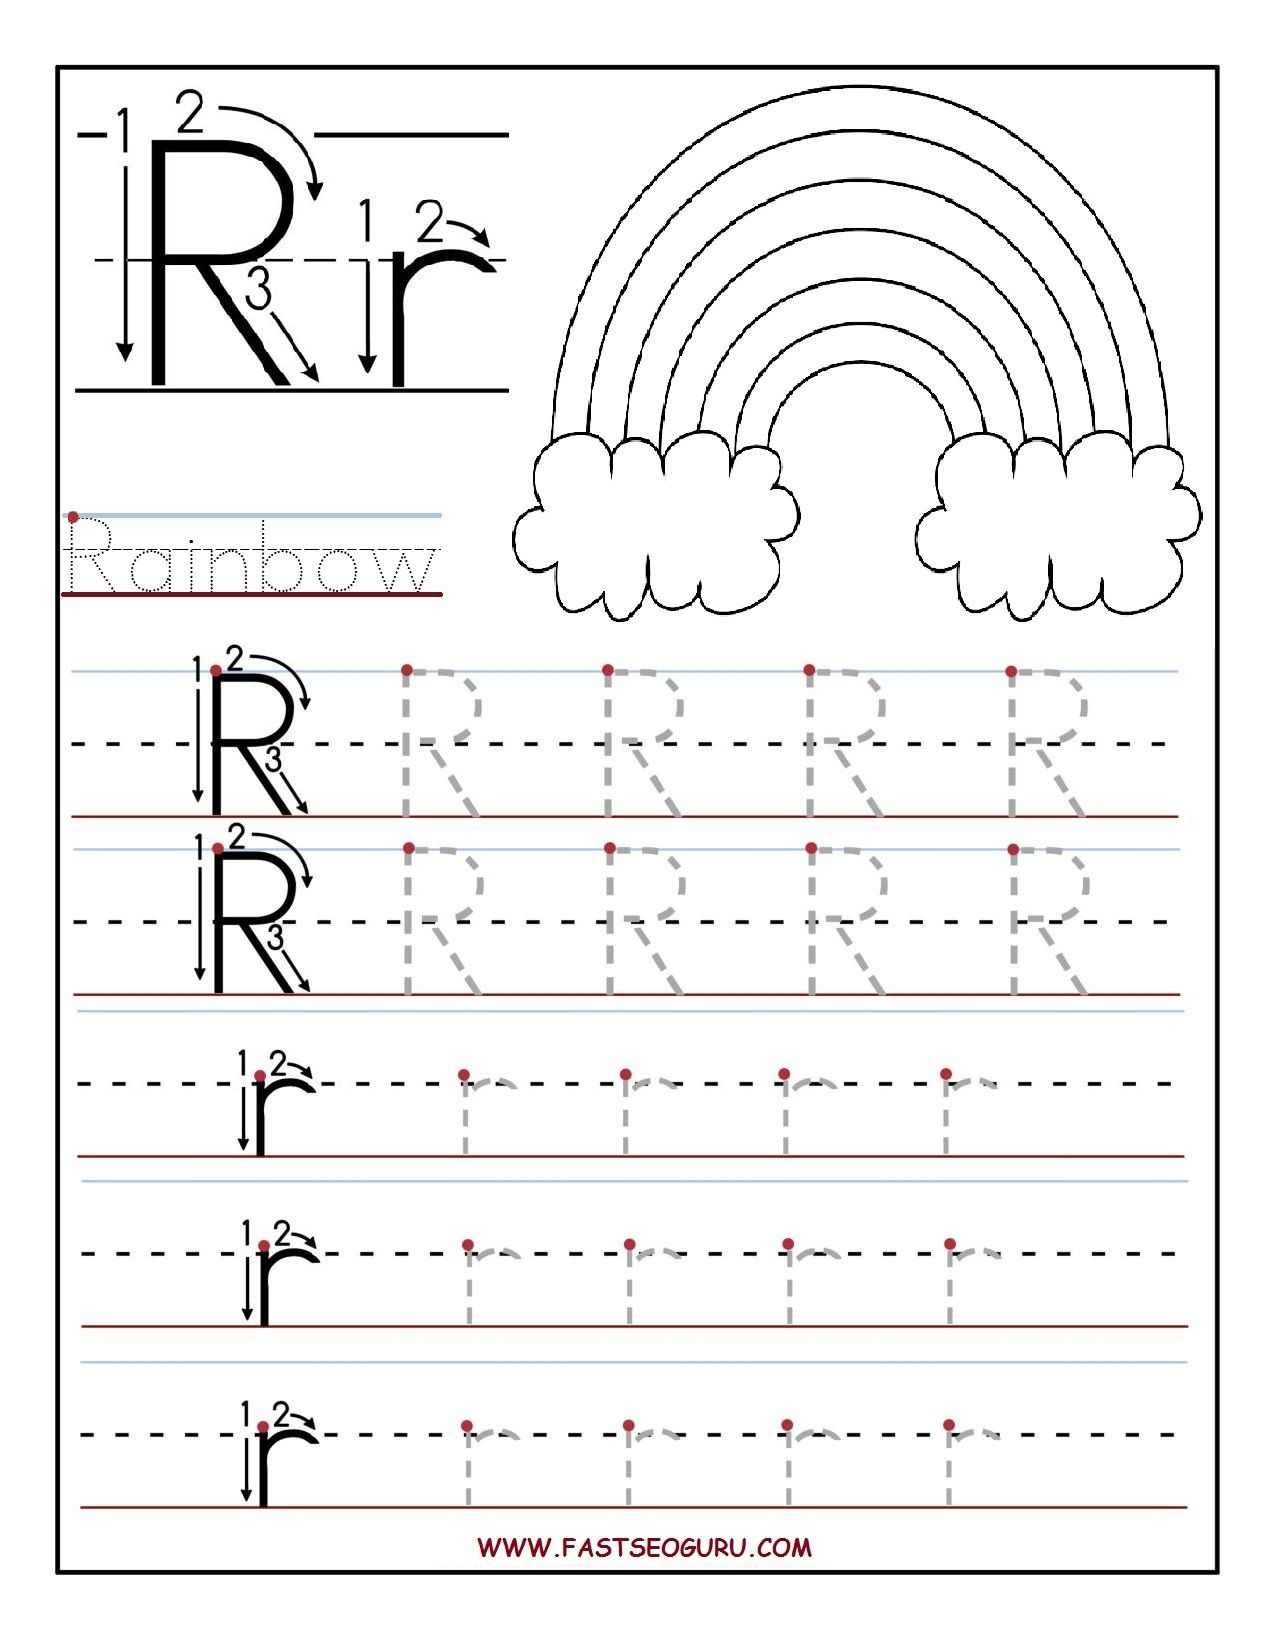 Printable Letter R Tracing Worksheets For Preschool | Letter regarding Letter P Tracing Worksheets For Preschool